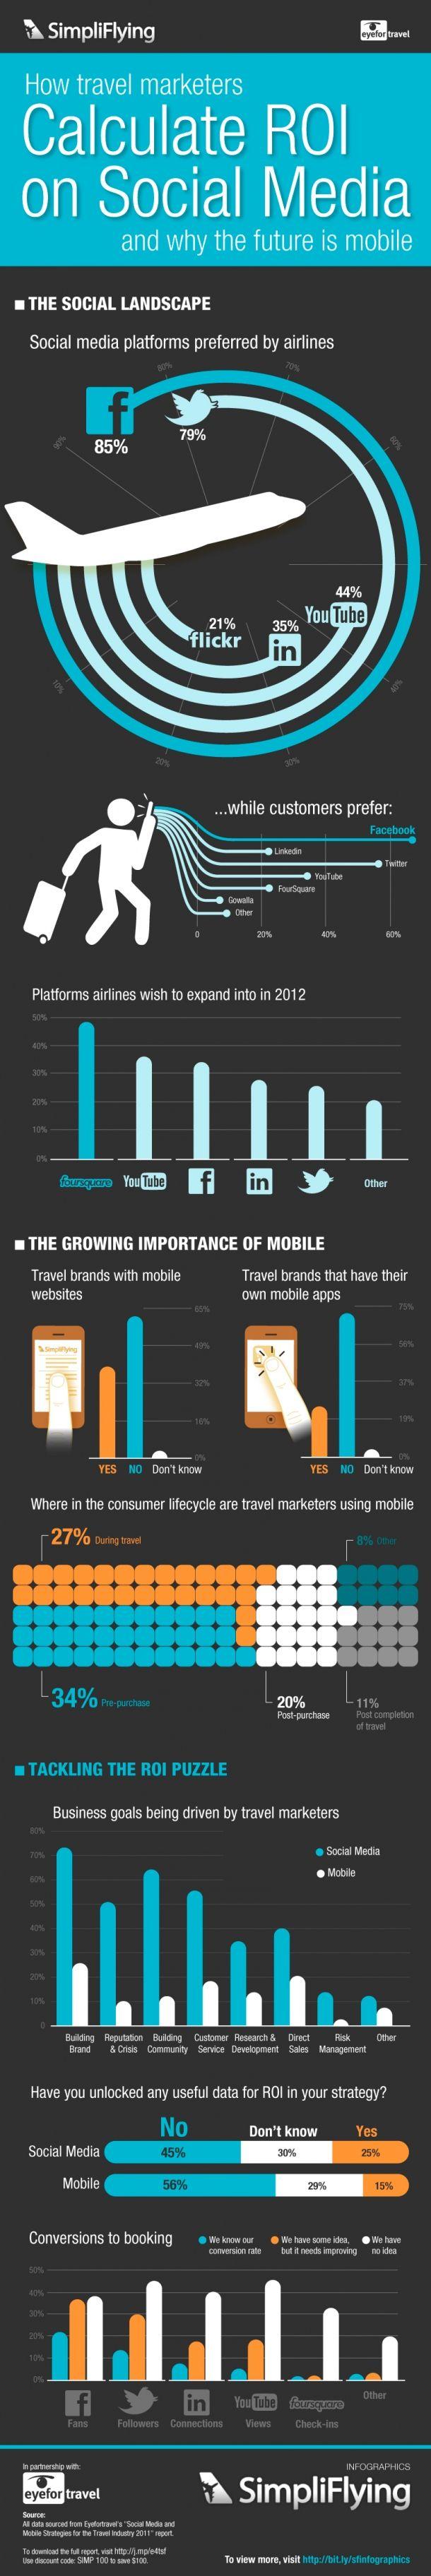 Calculate ROI on social media, by @simpliflying #social #smm